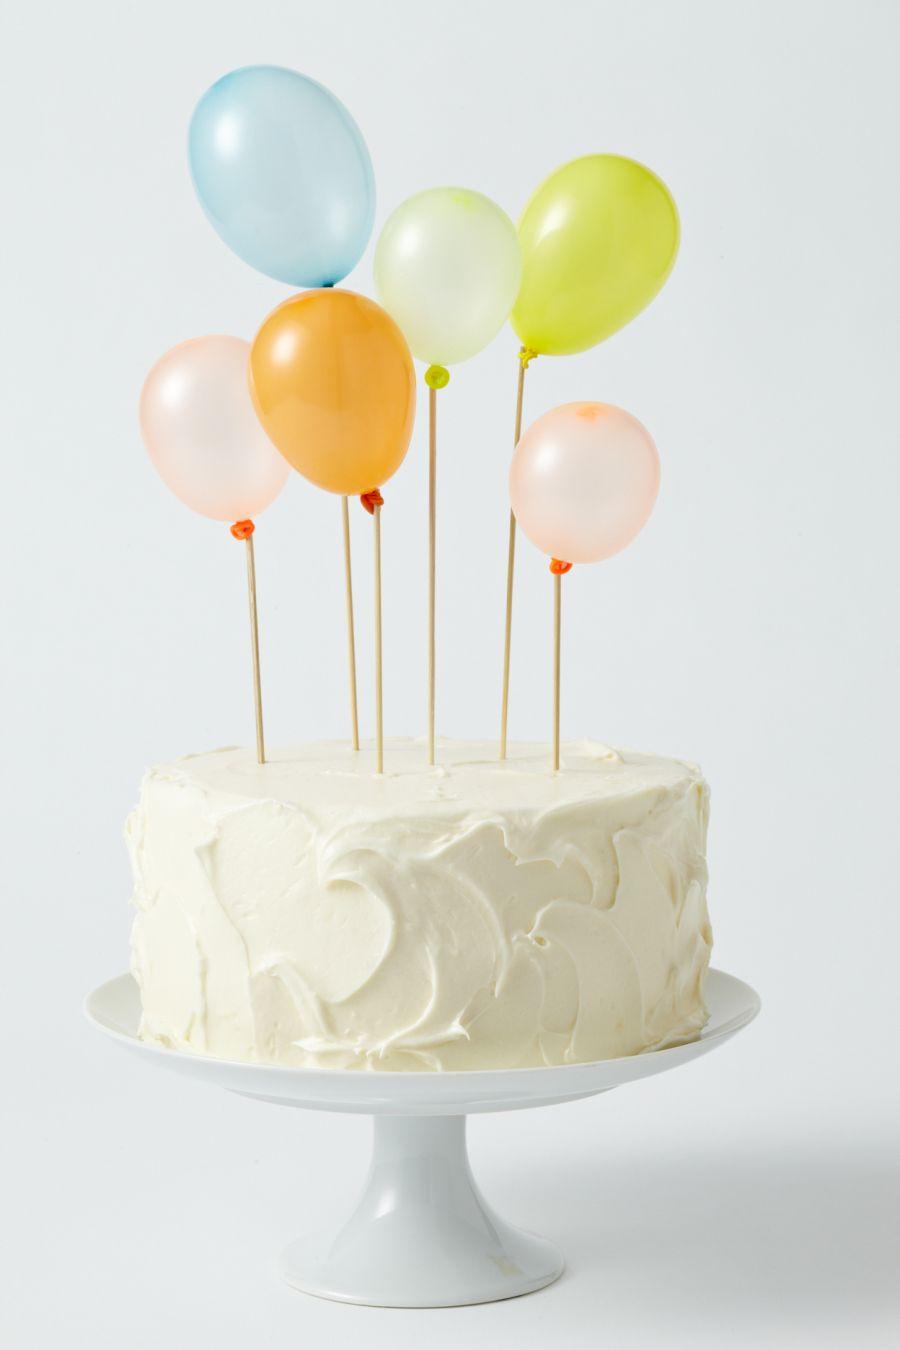 Cake Martha stewart Decoration and Cake